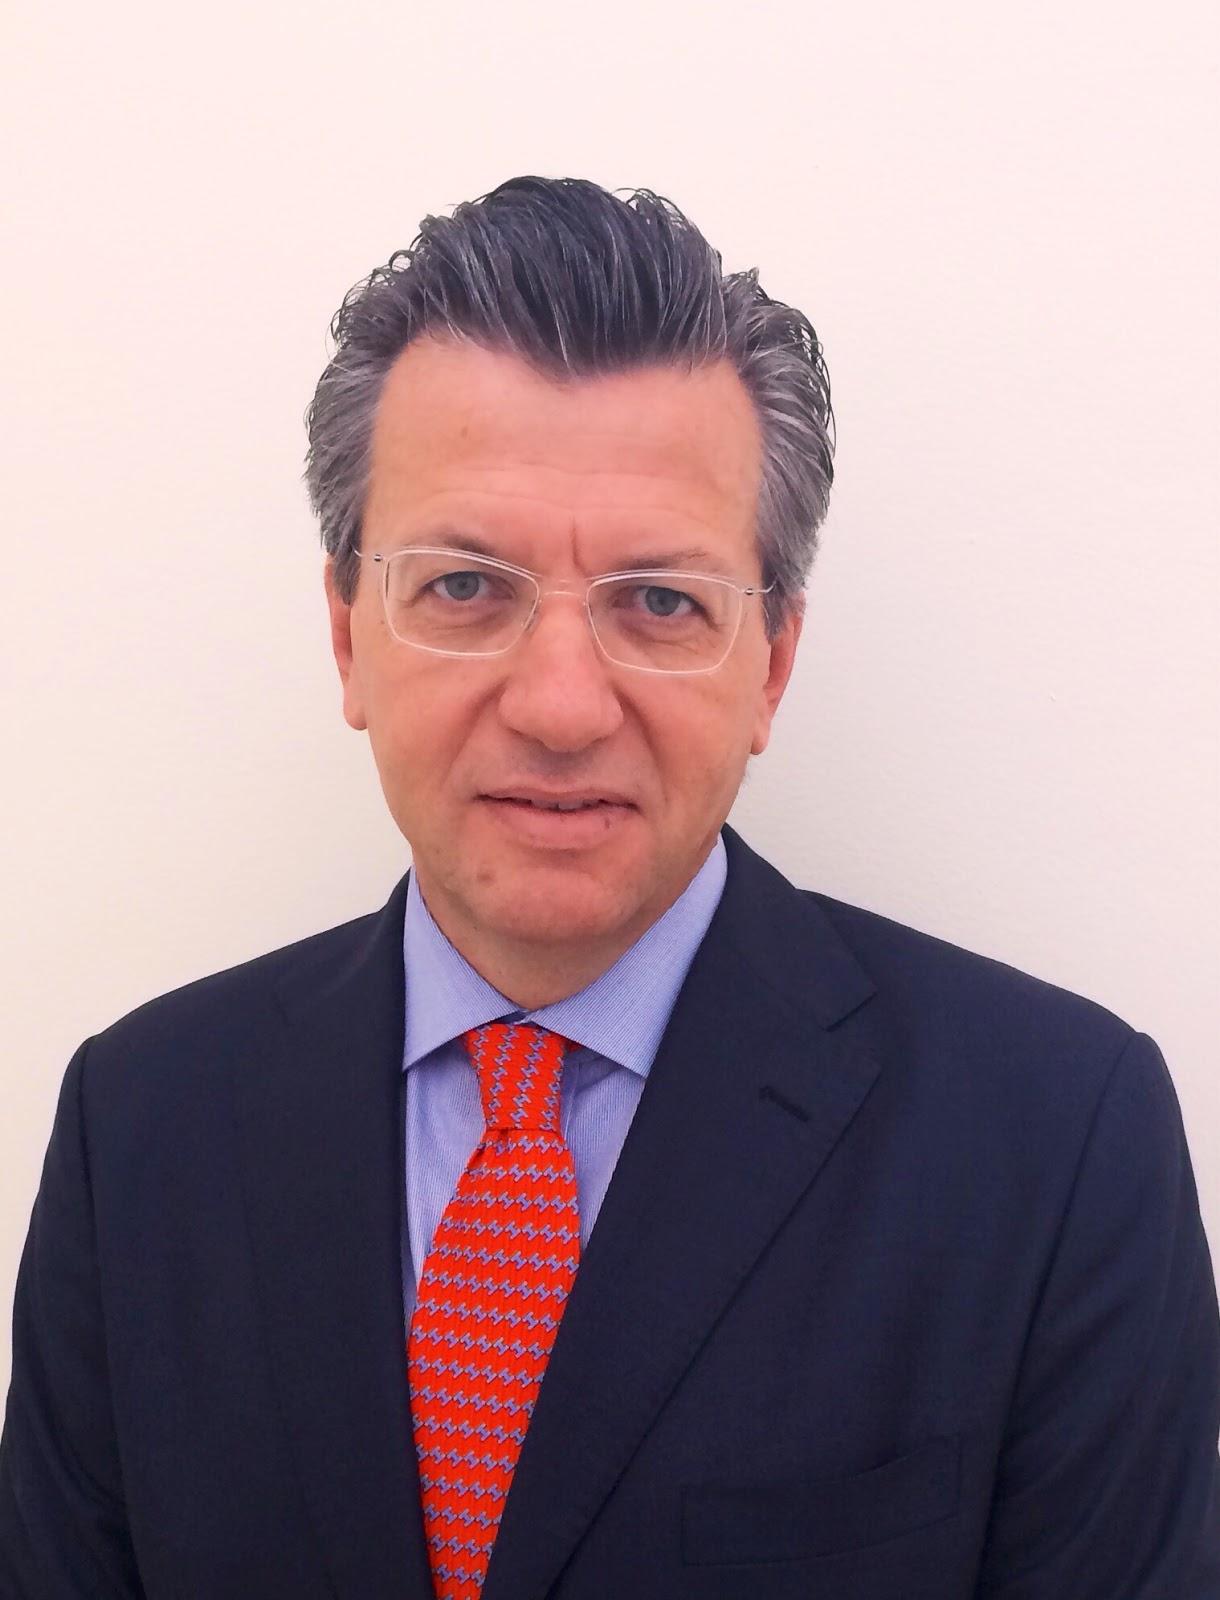 Nassos2BKravvaritis Ο Νάσος Κραββαρίτης νέος διευθυντής Marketing στην Κia Hellas Kia, αντιπροσωπείες, ειδήσεις